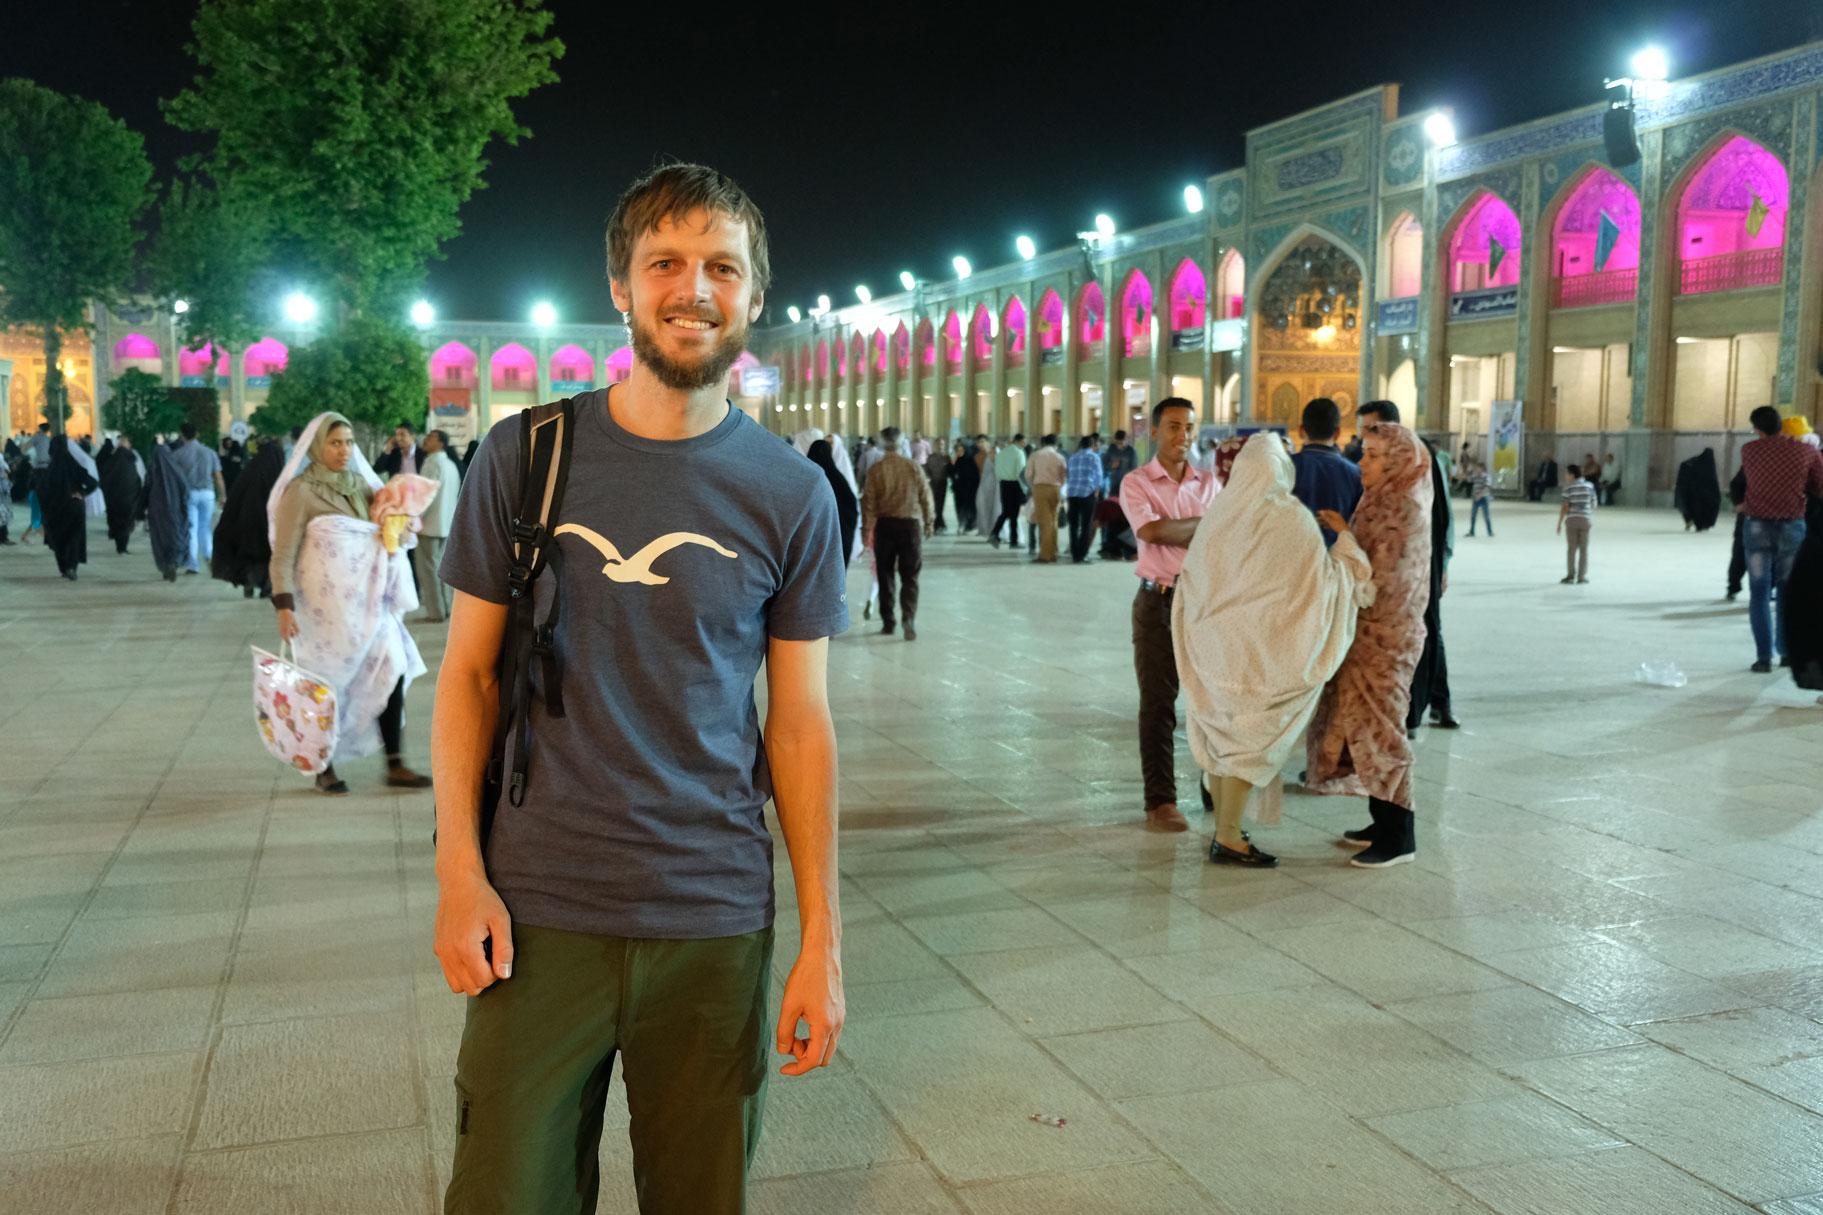 Sebastian auf einem belebten Platz im Schāh-e Tscherāgh